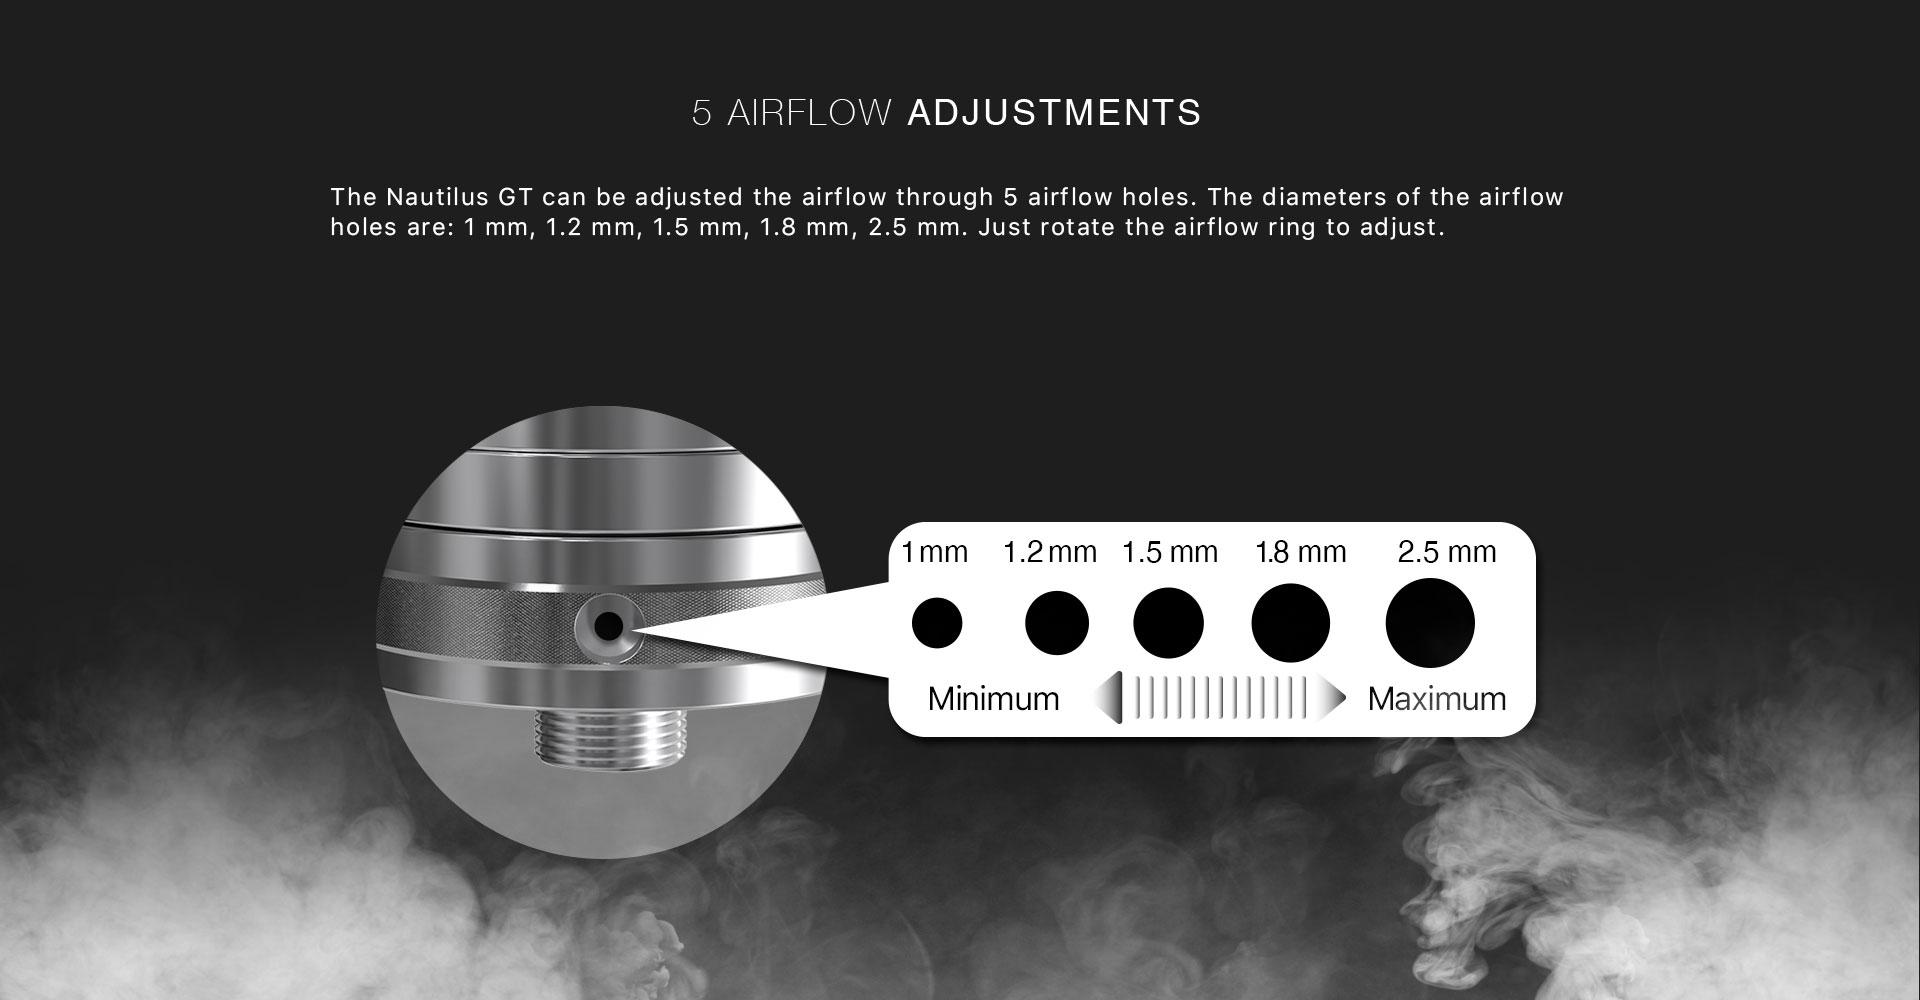 Taifun x Aspire Nautilus GT Tank Air Flow Adjustments